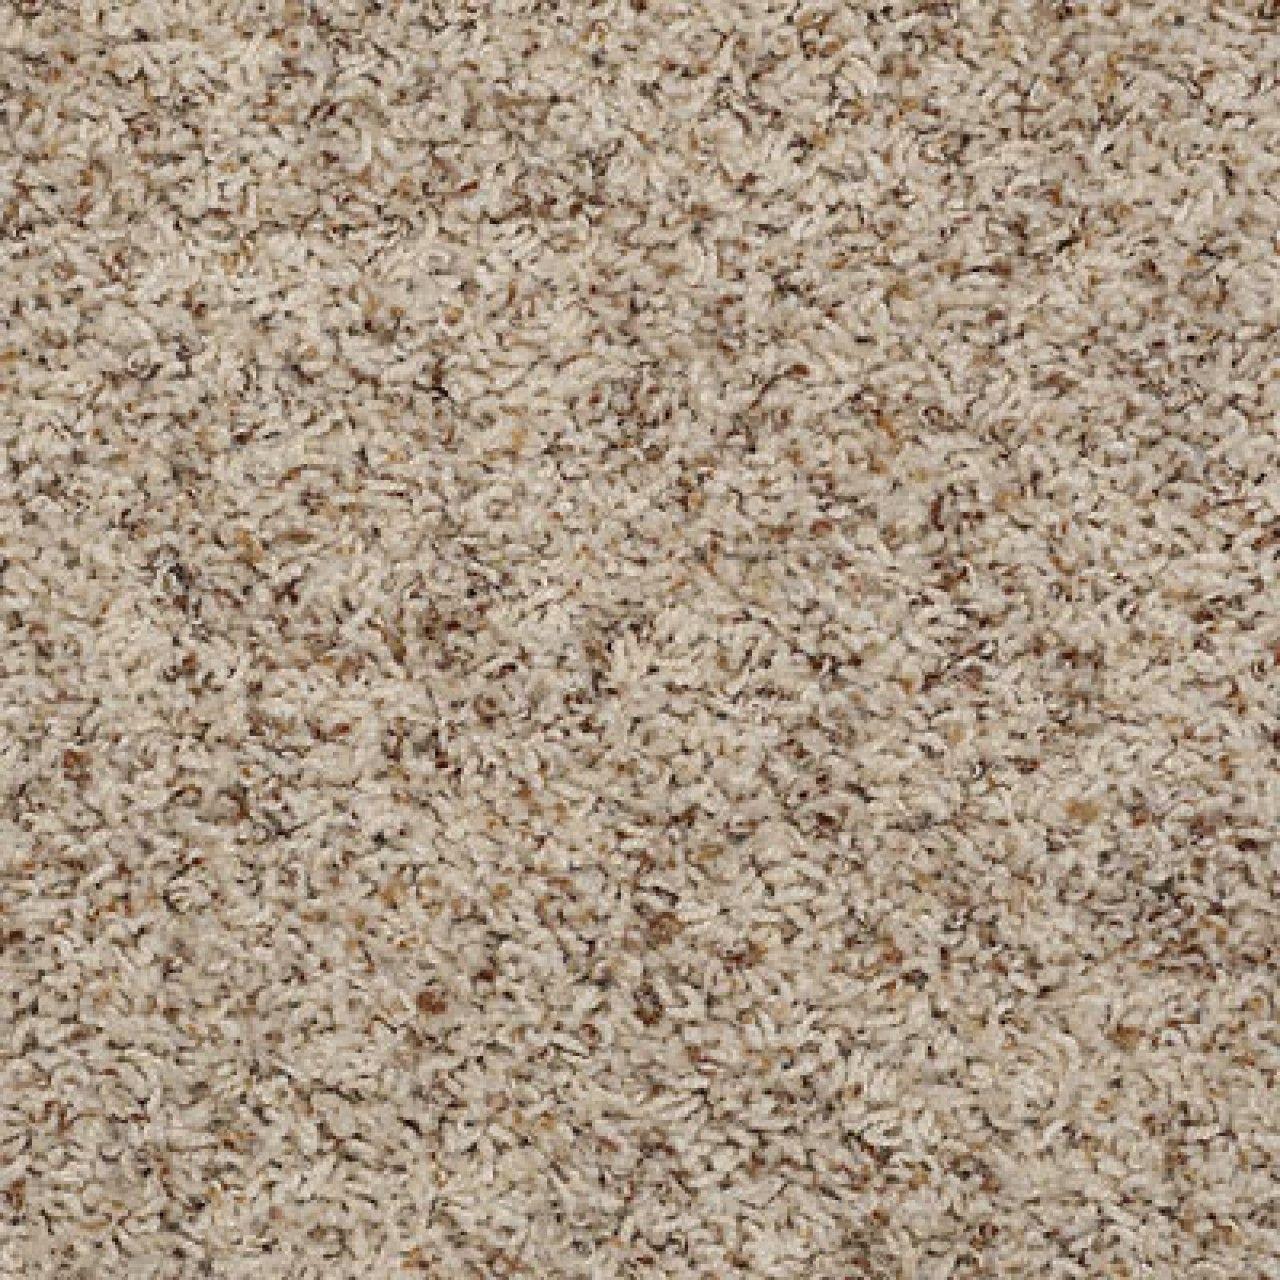 Color 00263 Sandbox Q4532 Alamar B Shaw Anso Nylon Carpet Georgia Industries